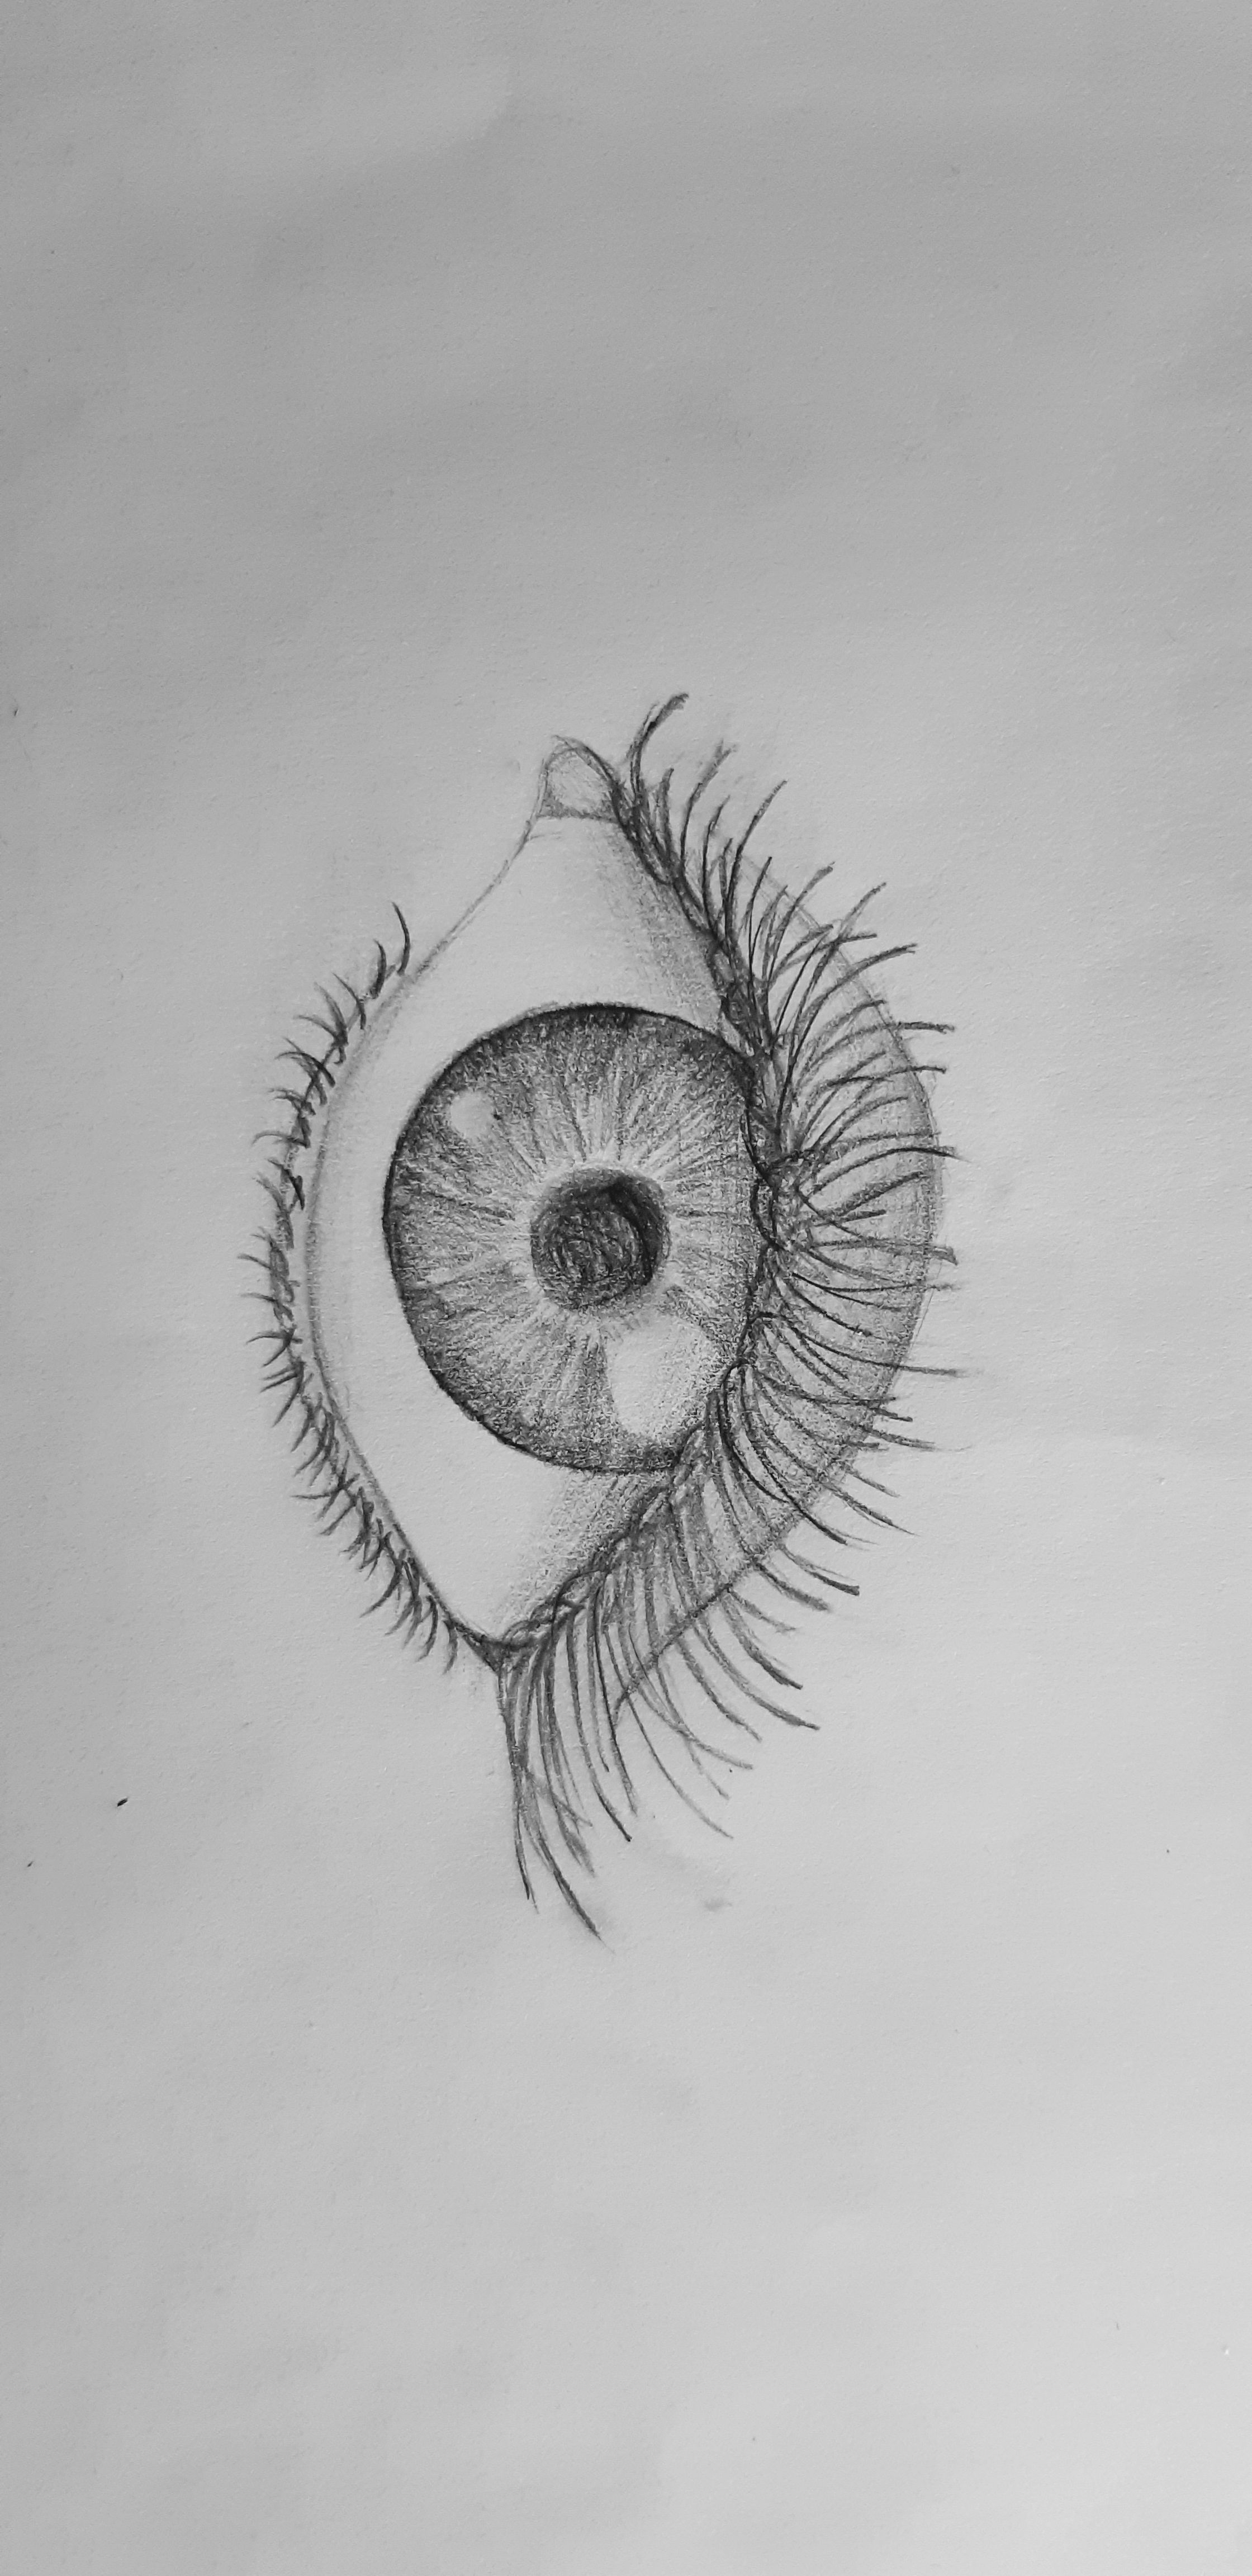 Dessin Au Crayon A Papier : dessin, crayon, papier, Dessin, Crayon, #dessin, #oeil, #crayon, #papier